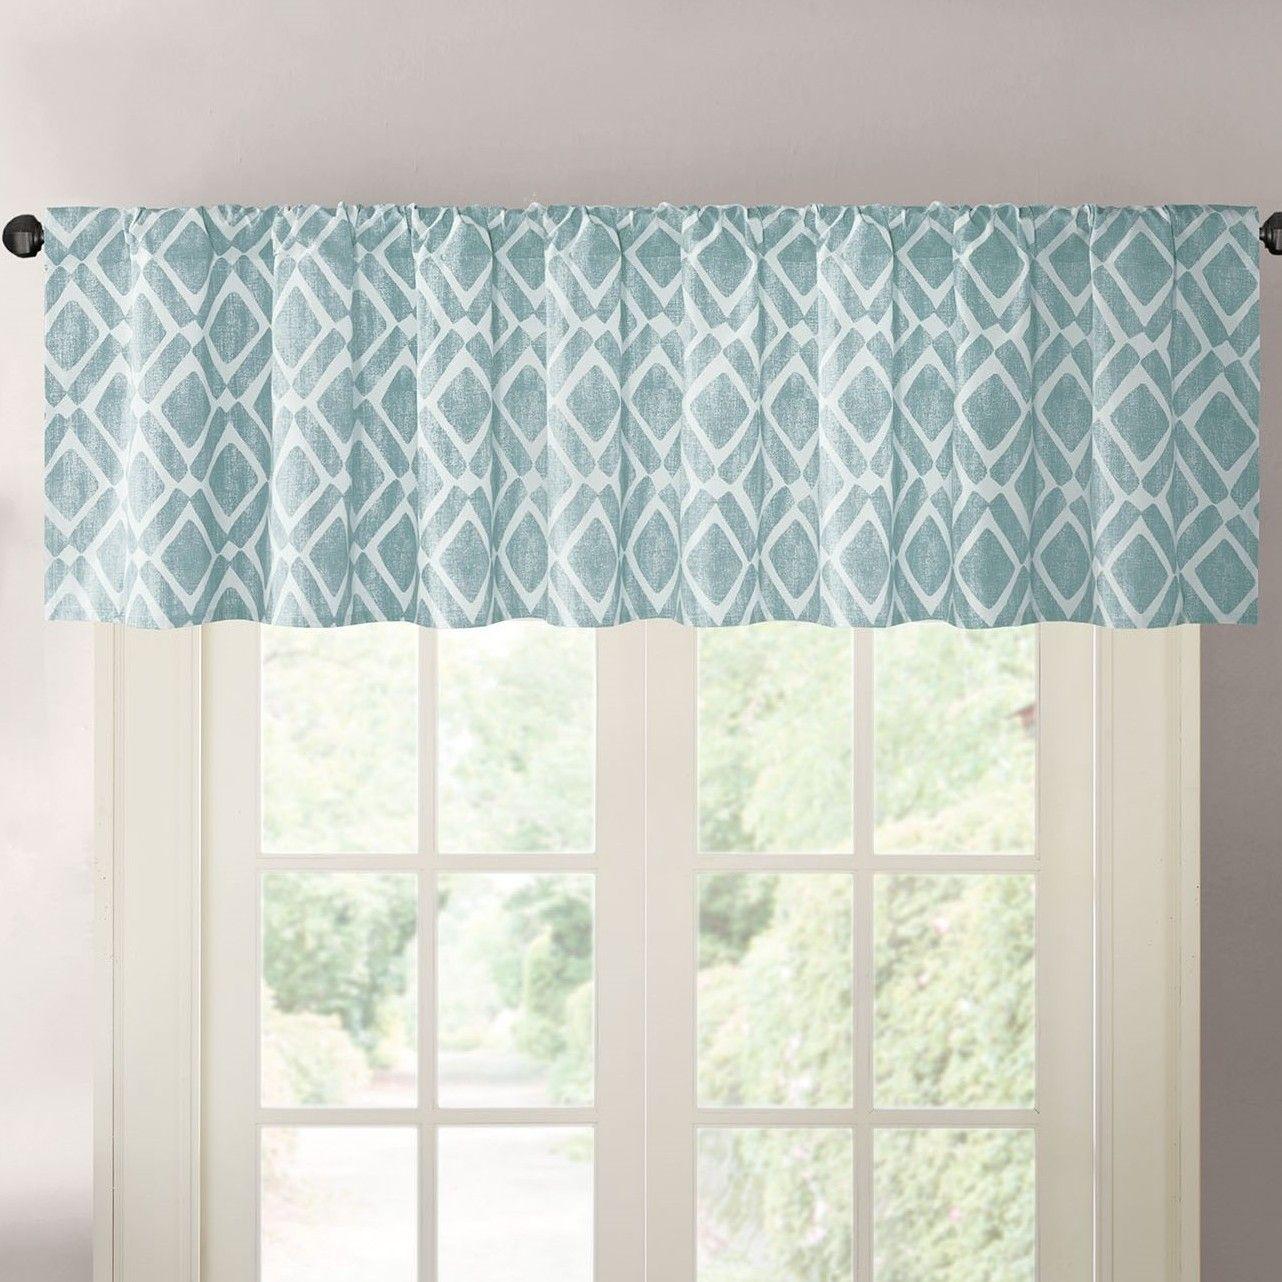 Parsons Diamond Rod Pocket Curtain Valance | beach house | Pinterest